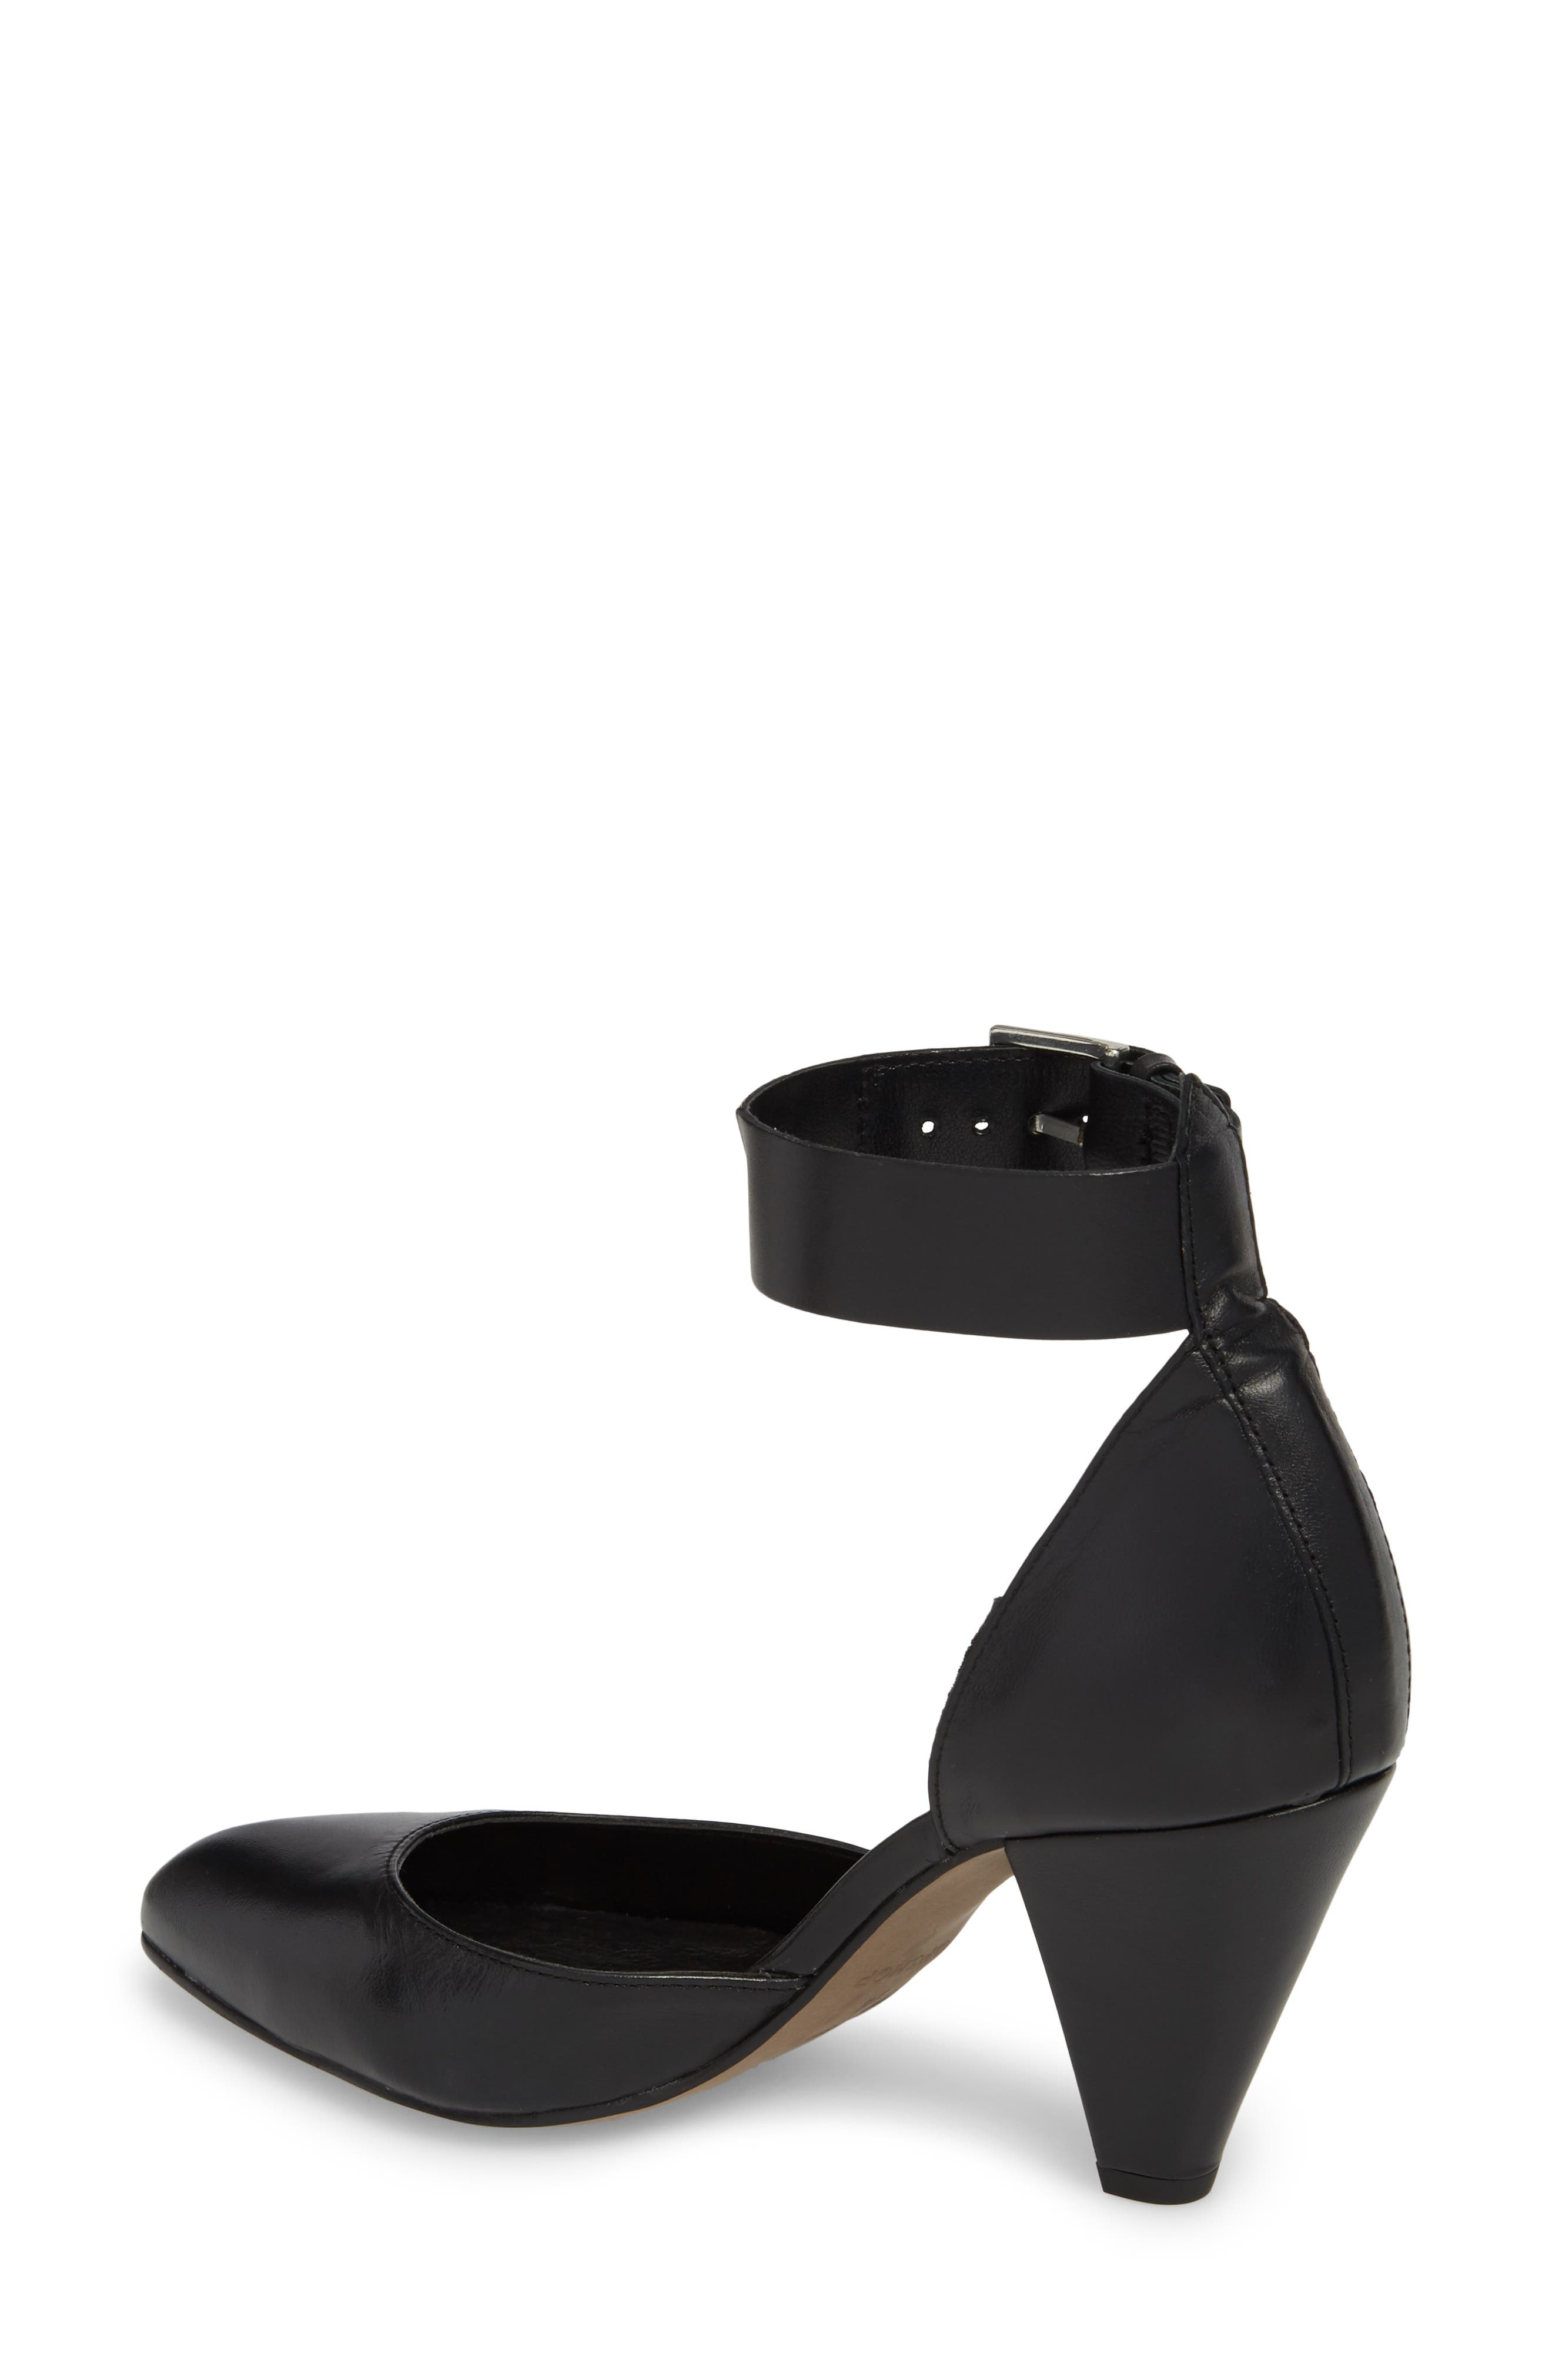 Jazzie Ankle Strap d'Orsay Pump,                             Alternate thumbnail 2, color,                             Black